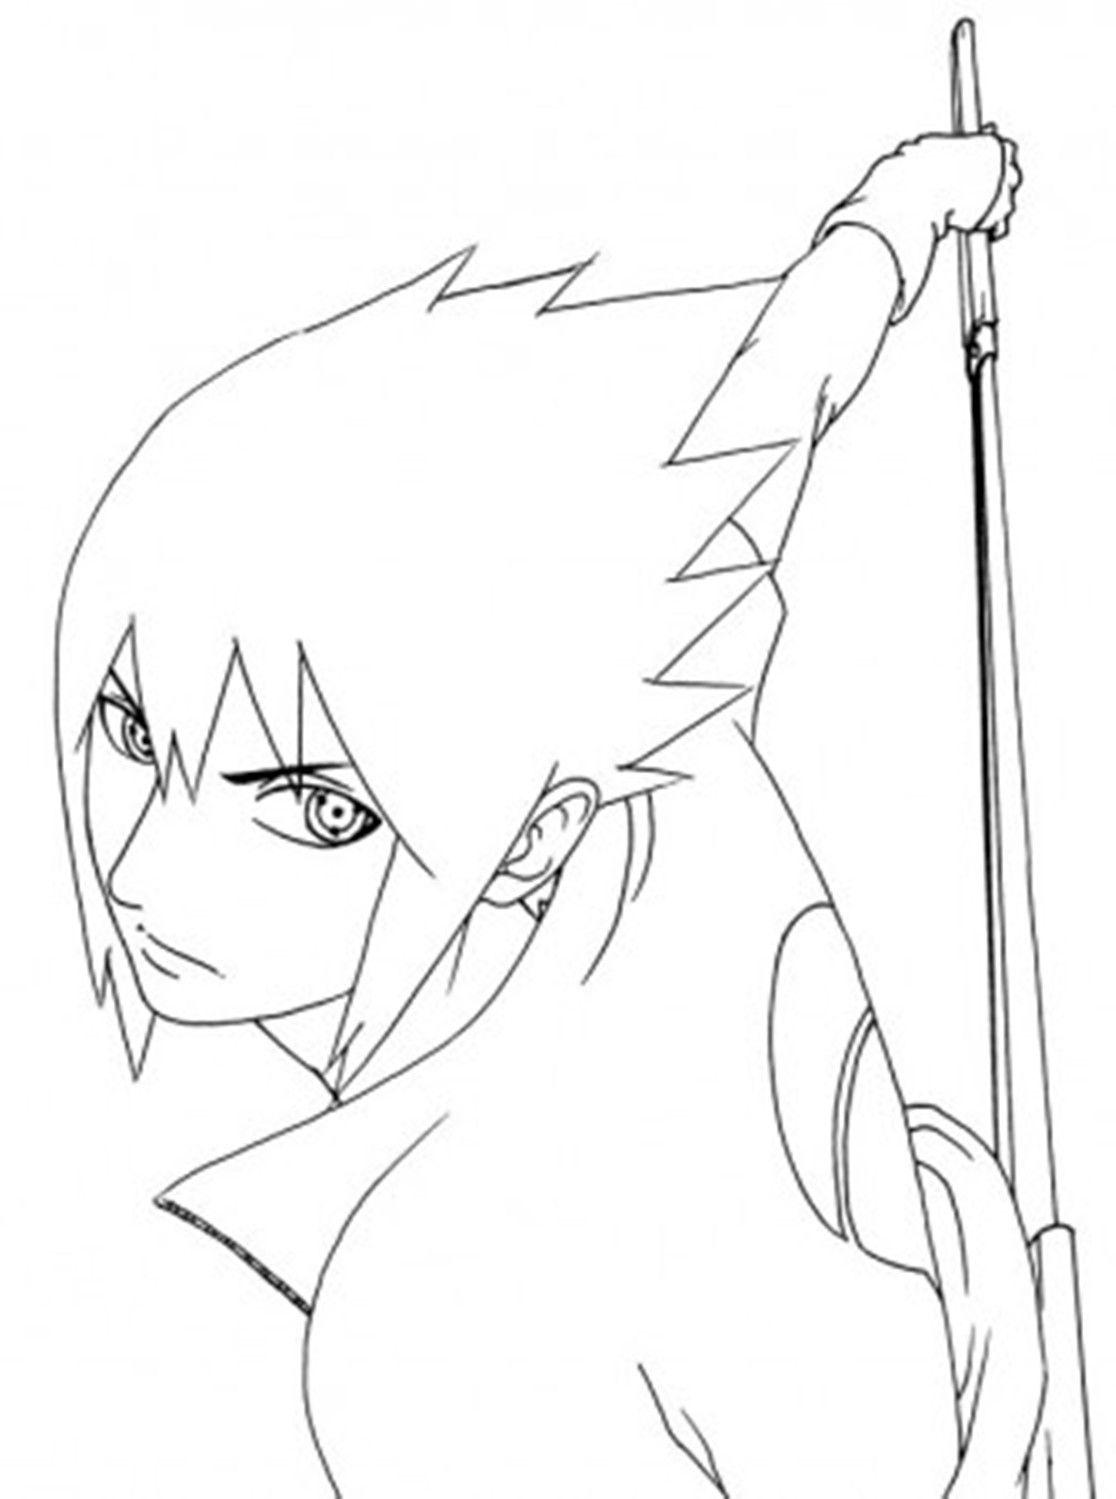 Sasuke Revoke Sword Coloring pages, Pokemon coloring